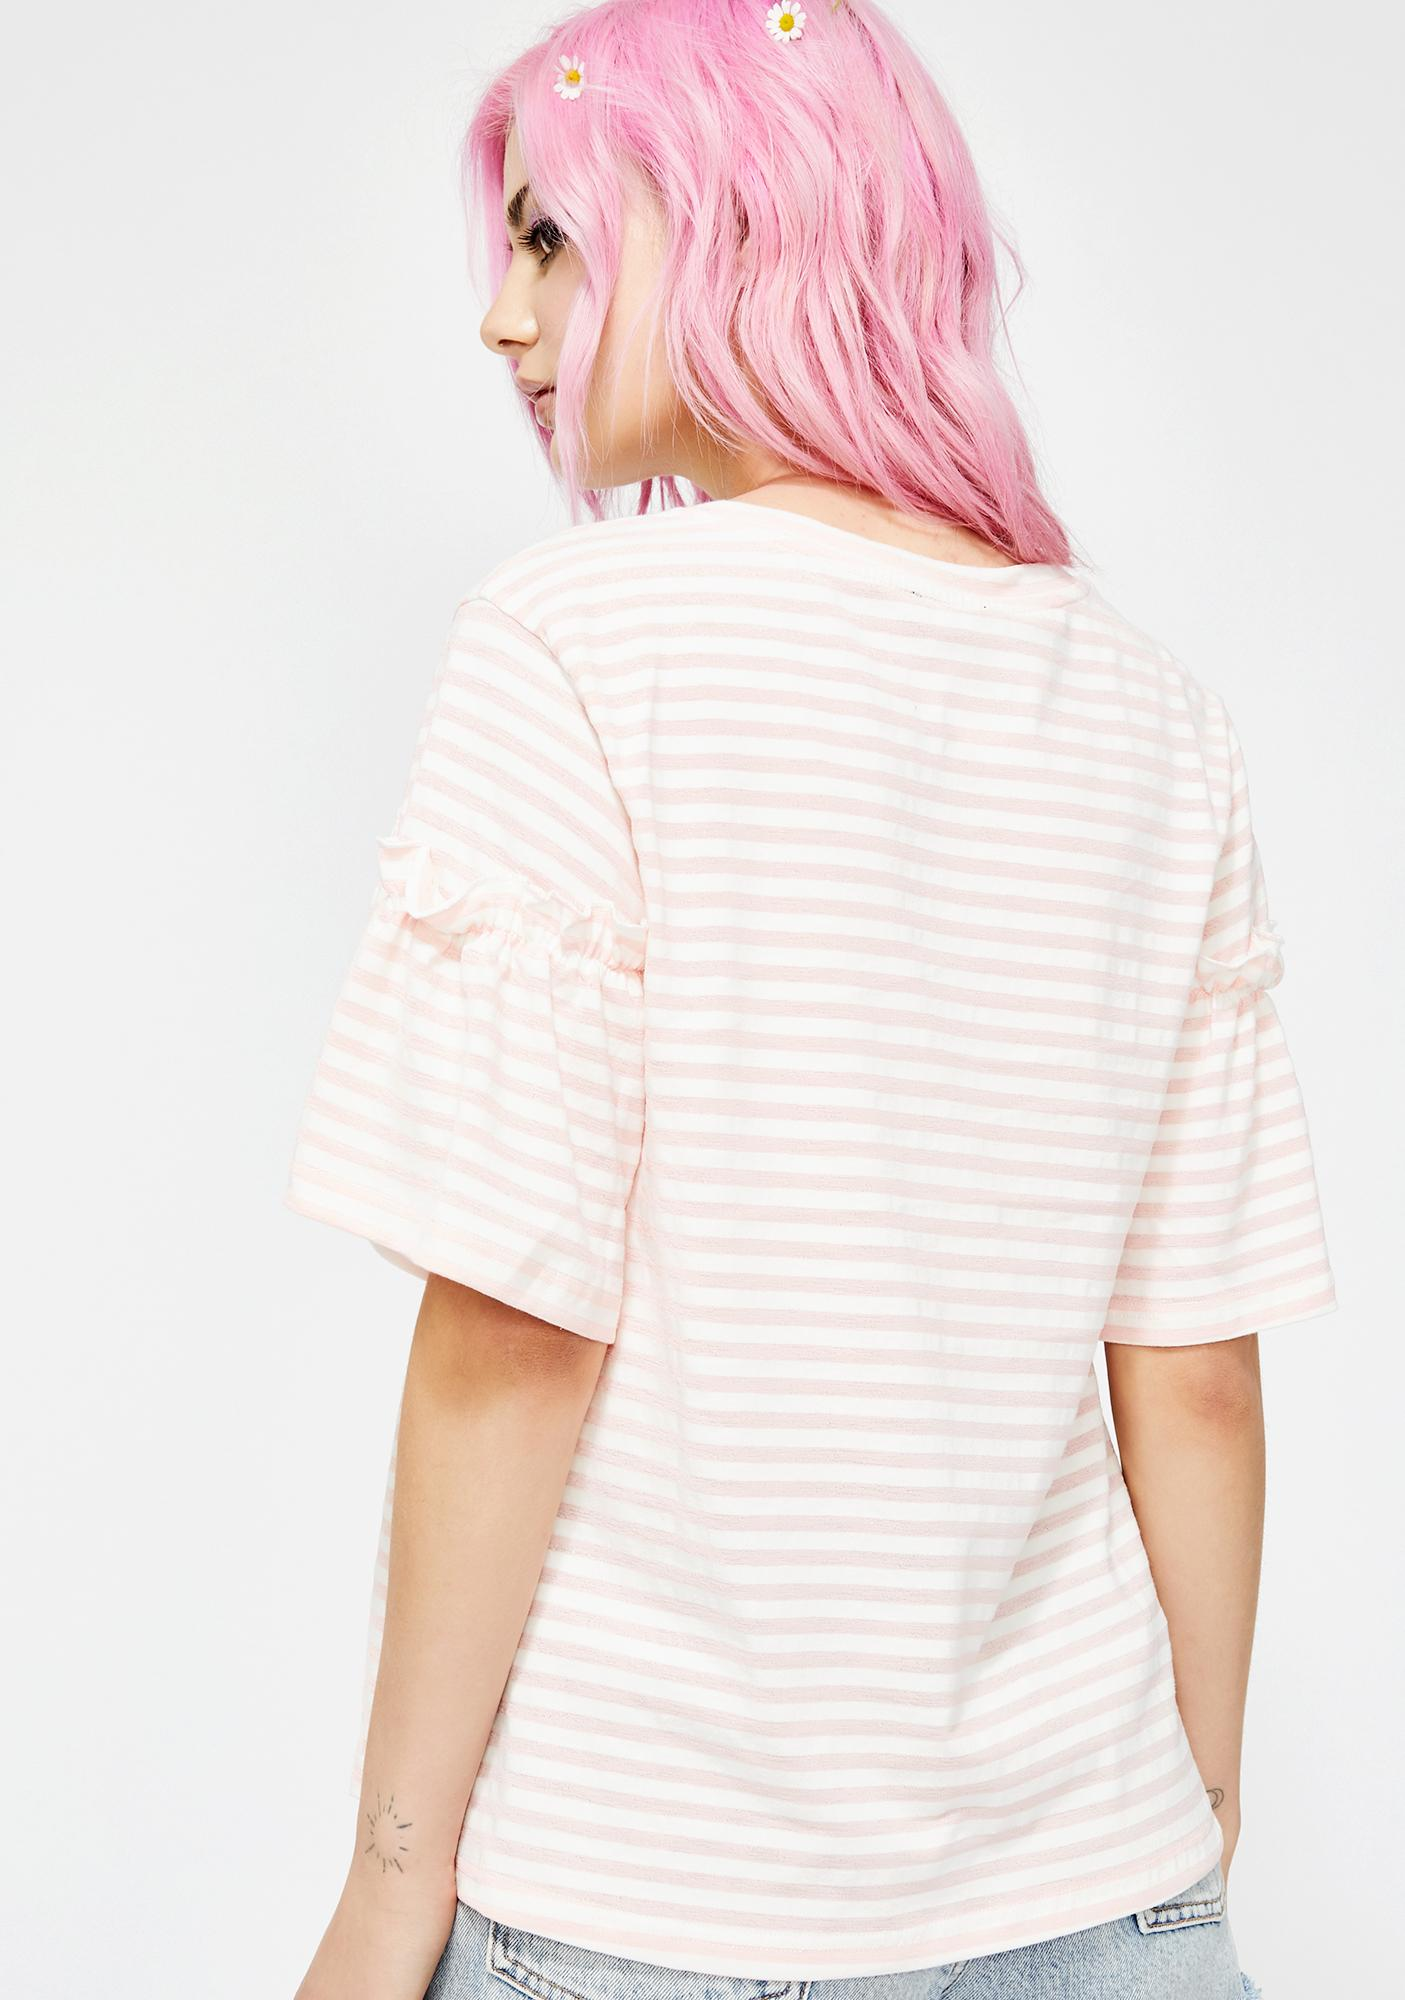 Blush Soft Spot Striped Tee